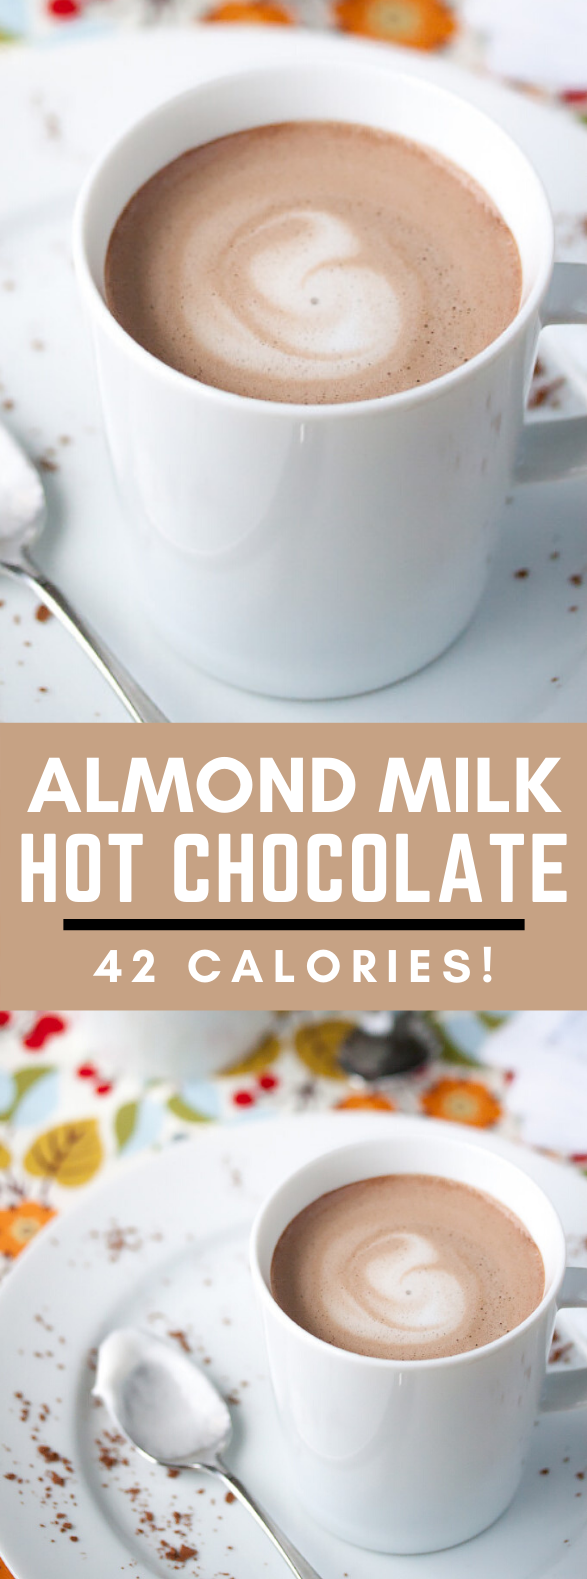 42-Calorie Almond Milk Hot Chocolate #drinks #healthydrink